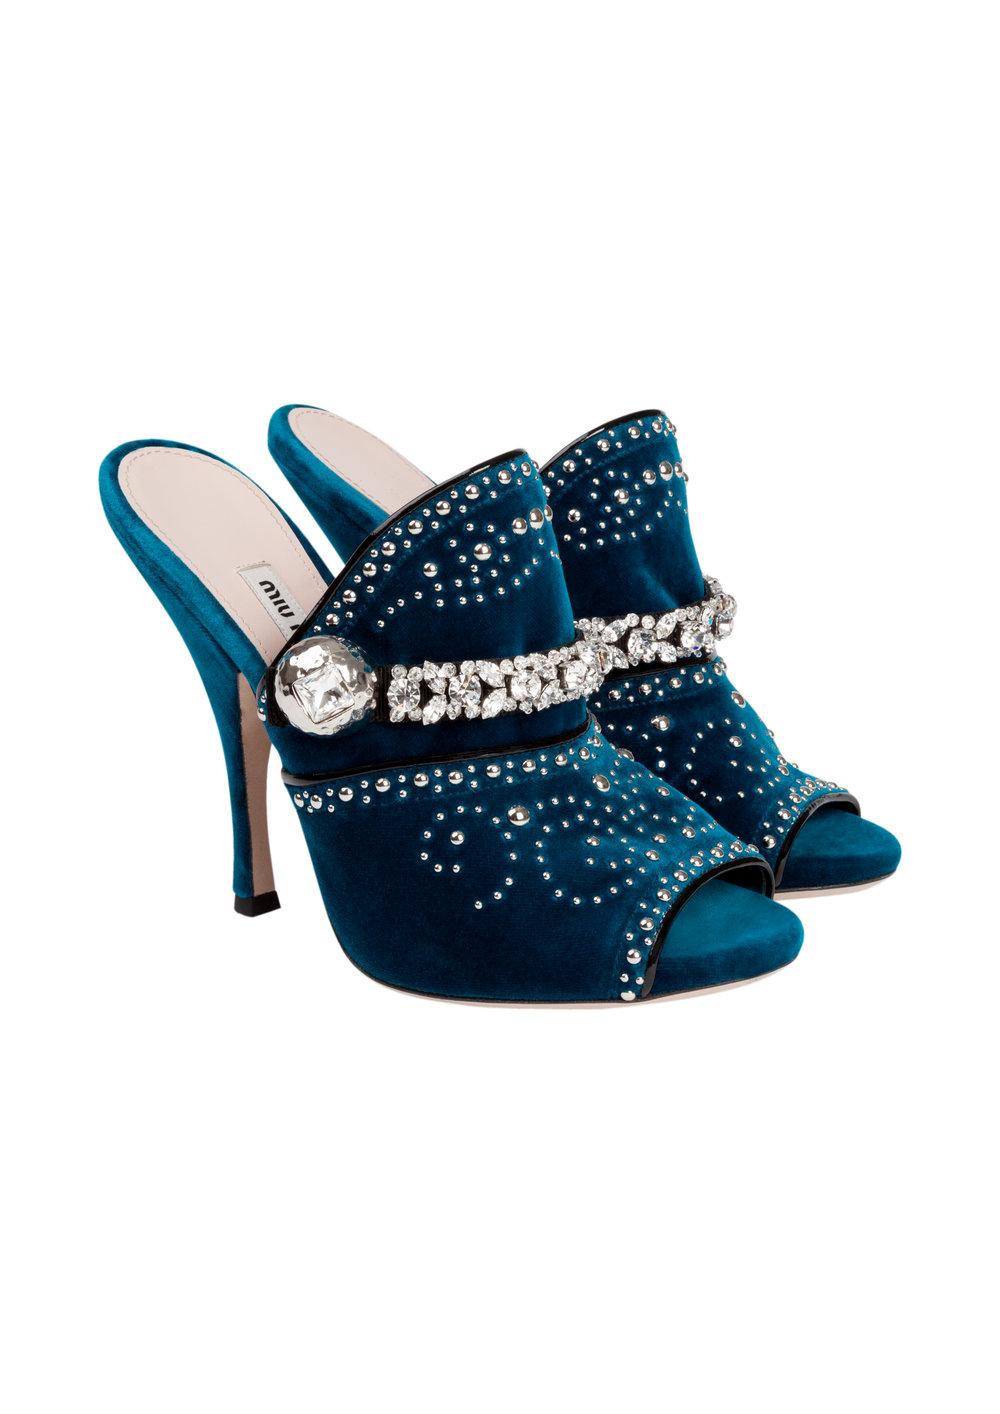 miumiu-shoes-bluevelvet-9.jpg